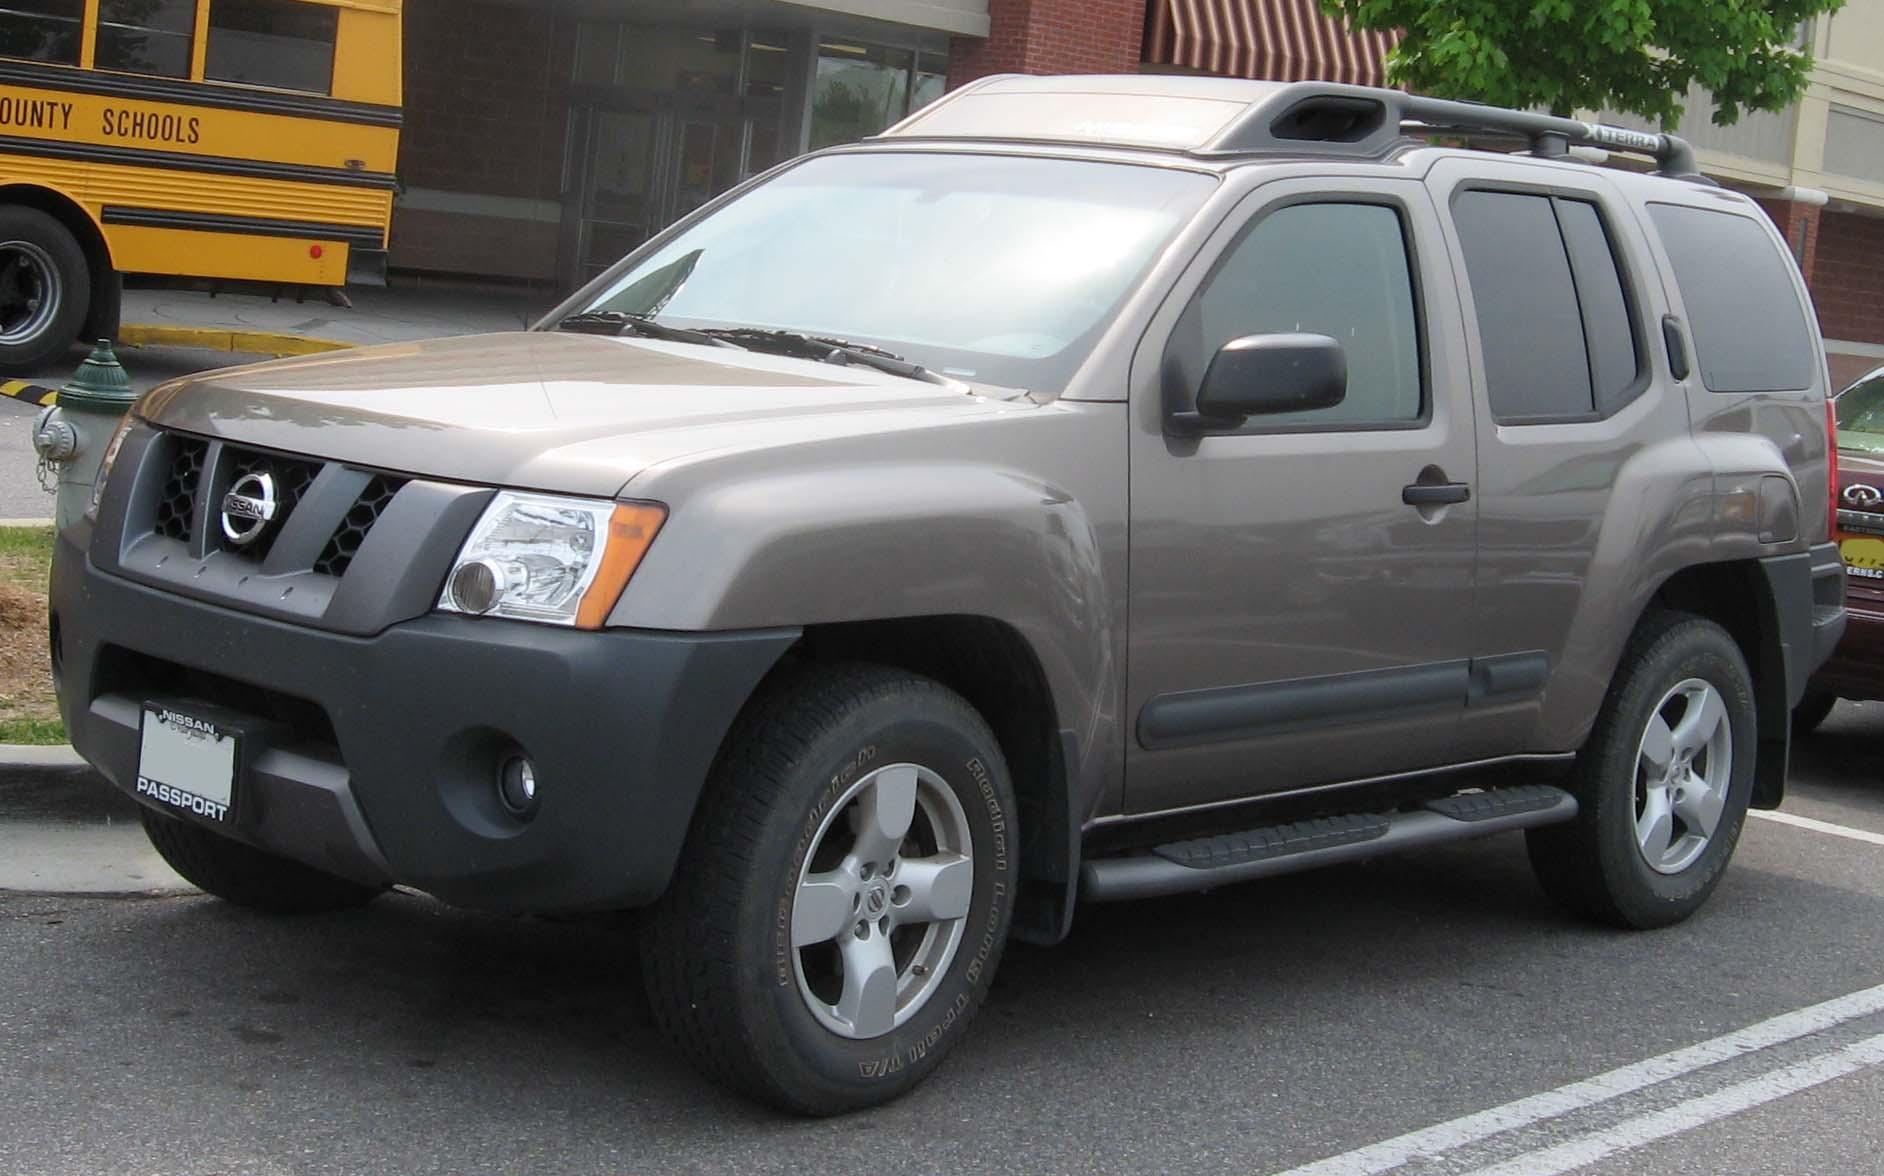 2007 Nissan Xterra S - 4dr SUV 4.0L V6 4x4 Manual